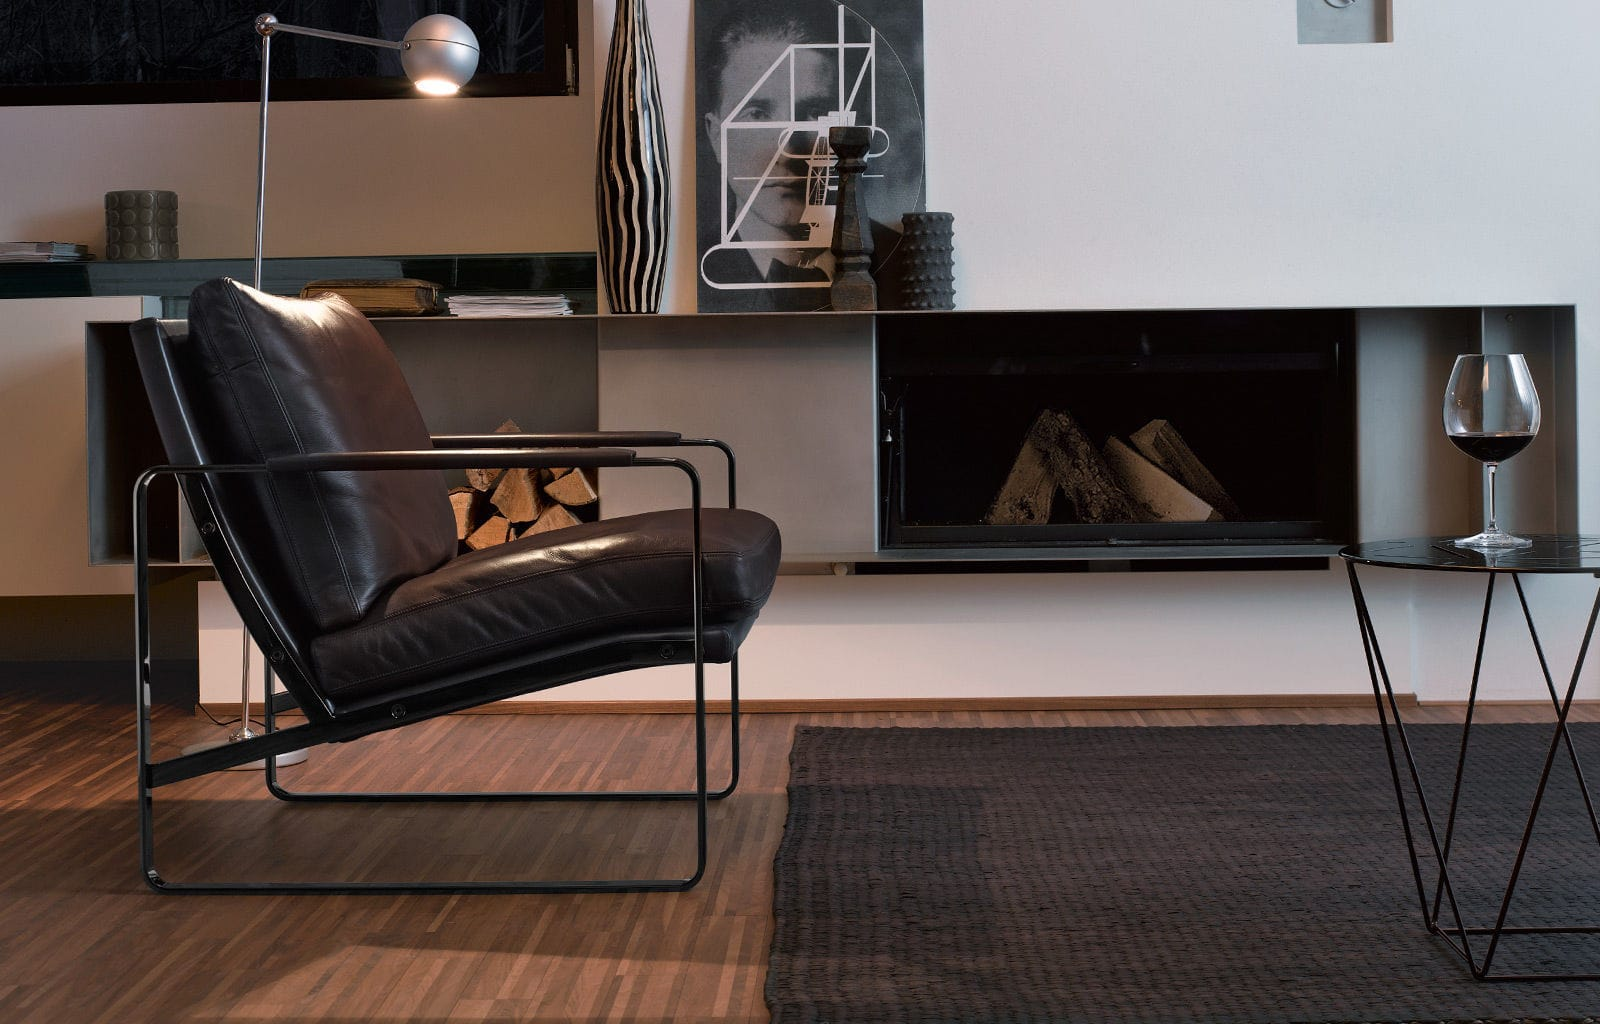 Fauteuil design scandinave en métal en cuir luge FABRICIUS